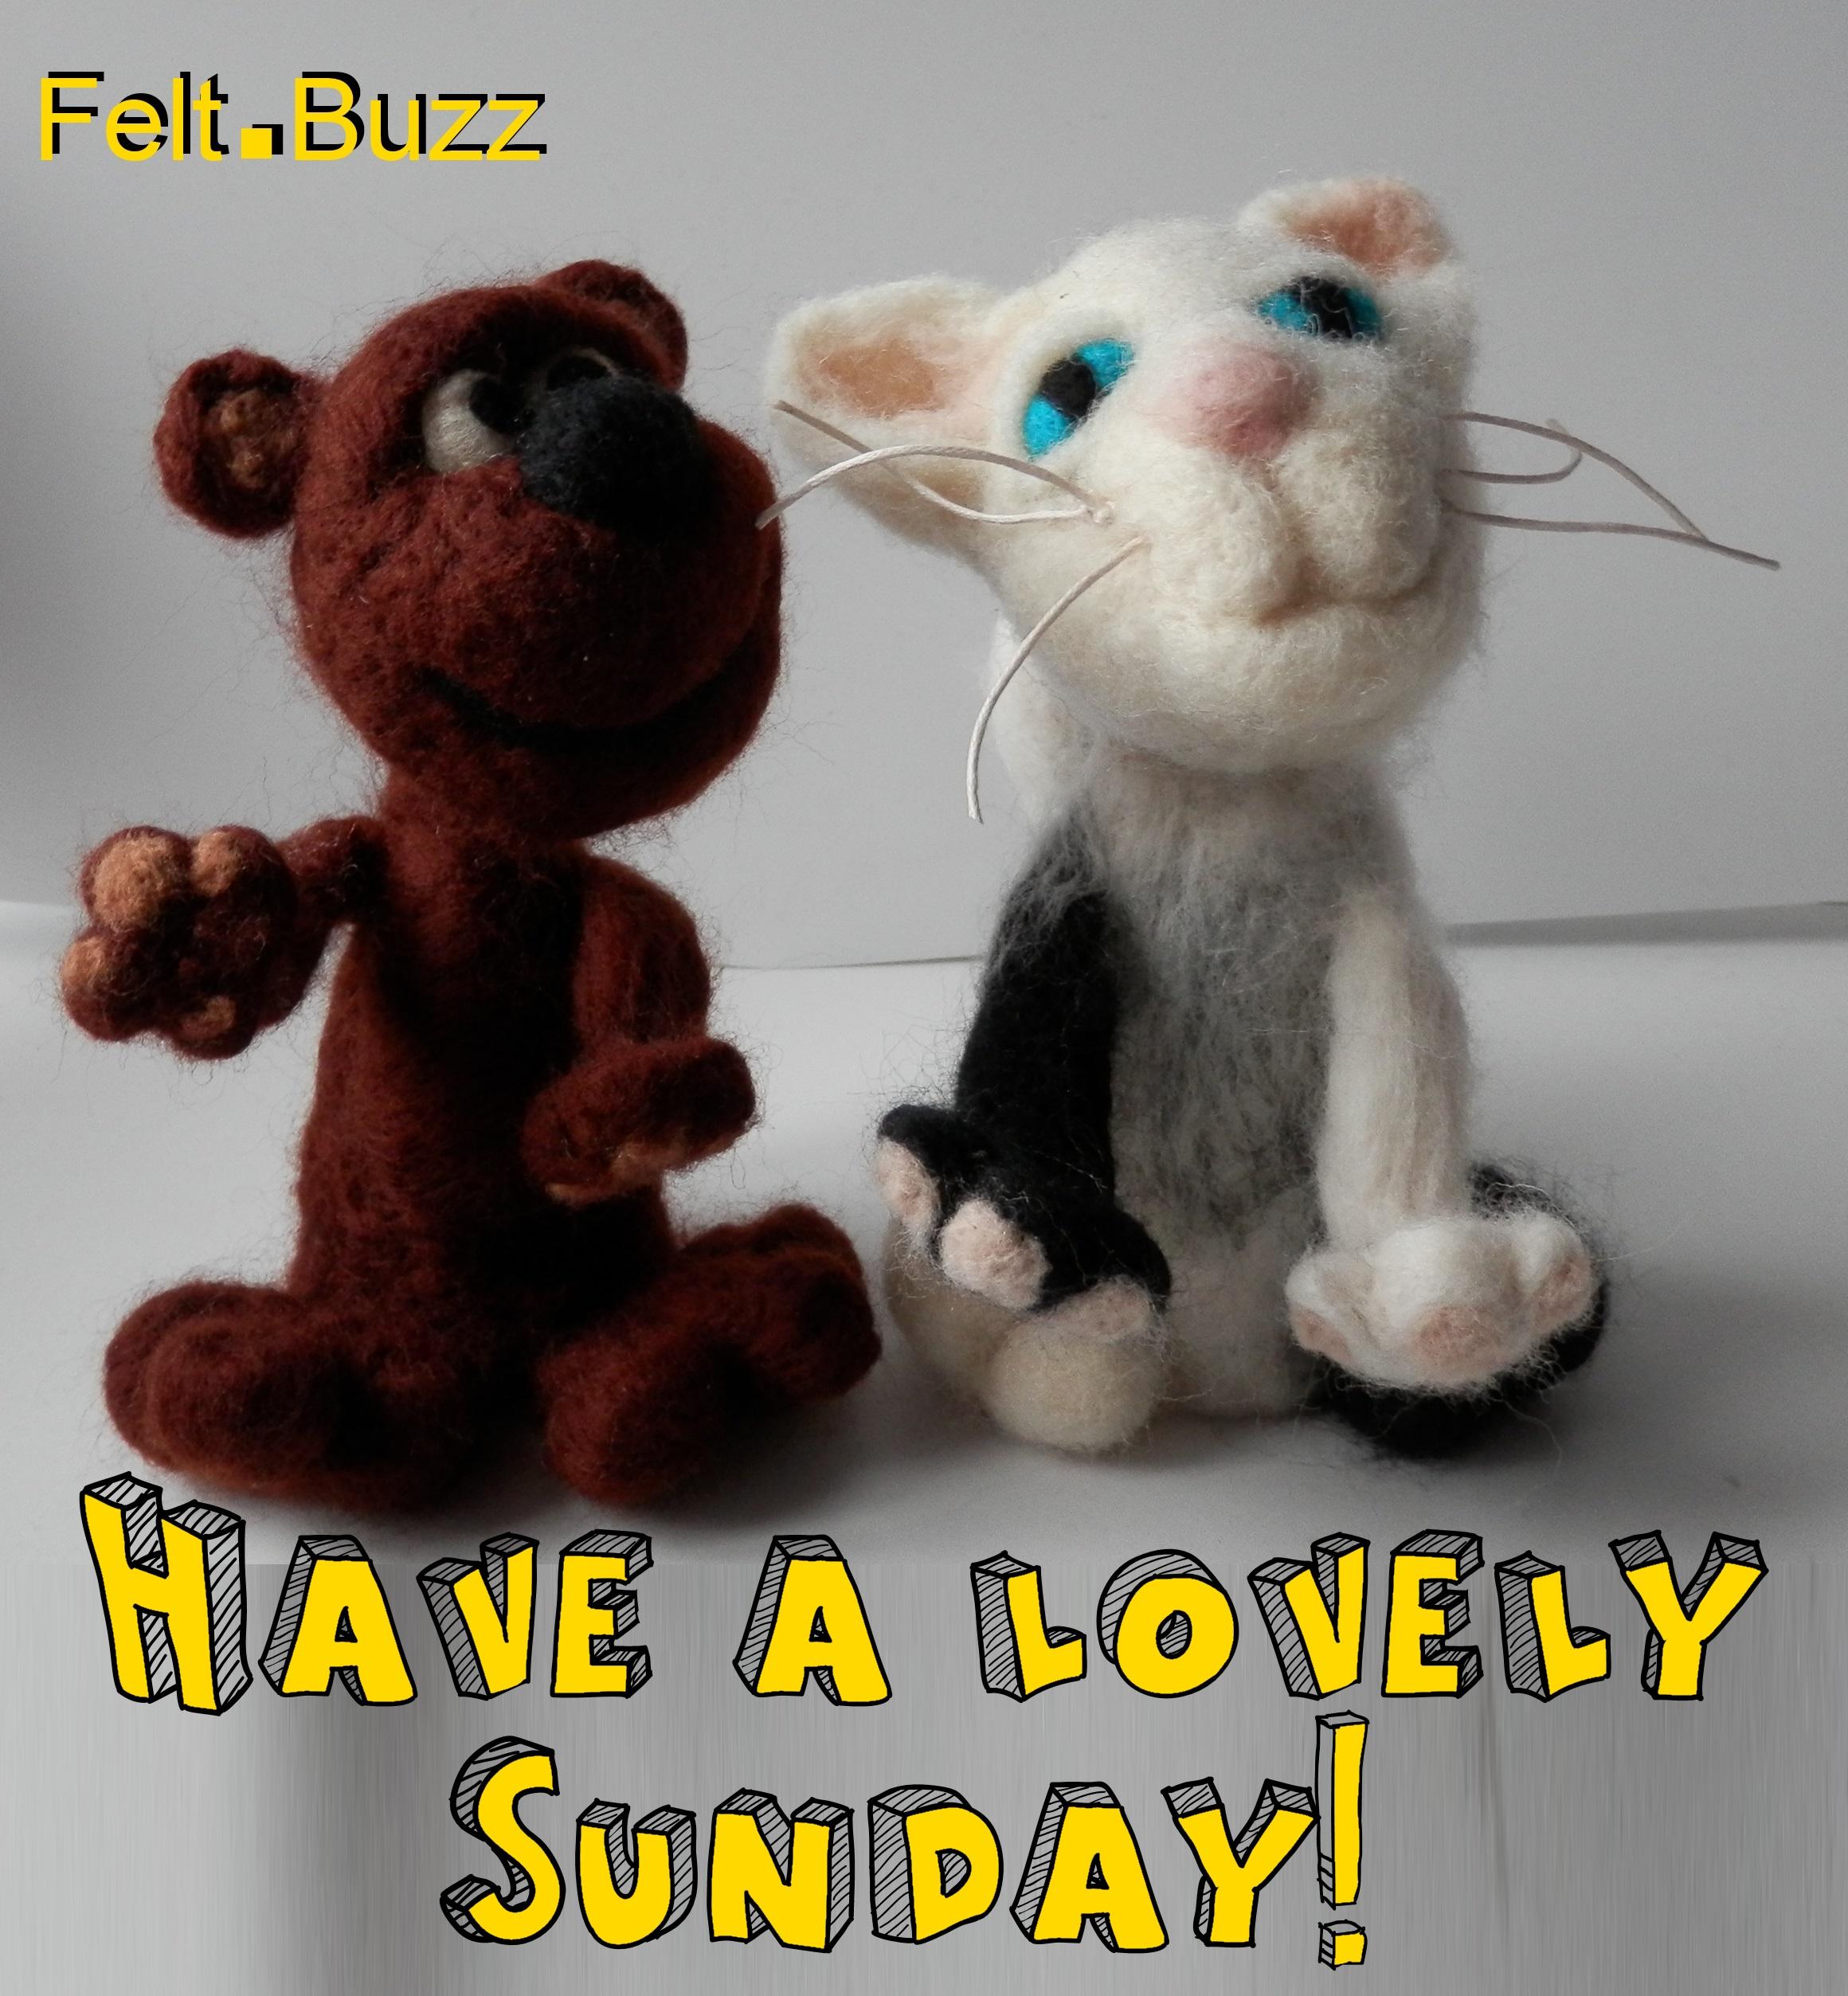 Have a fabulous Sunday everyone   Felt.Buzz